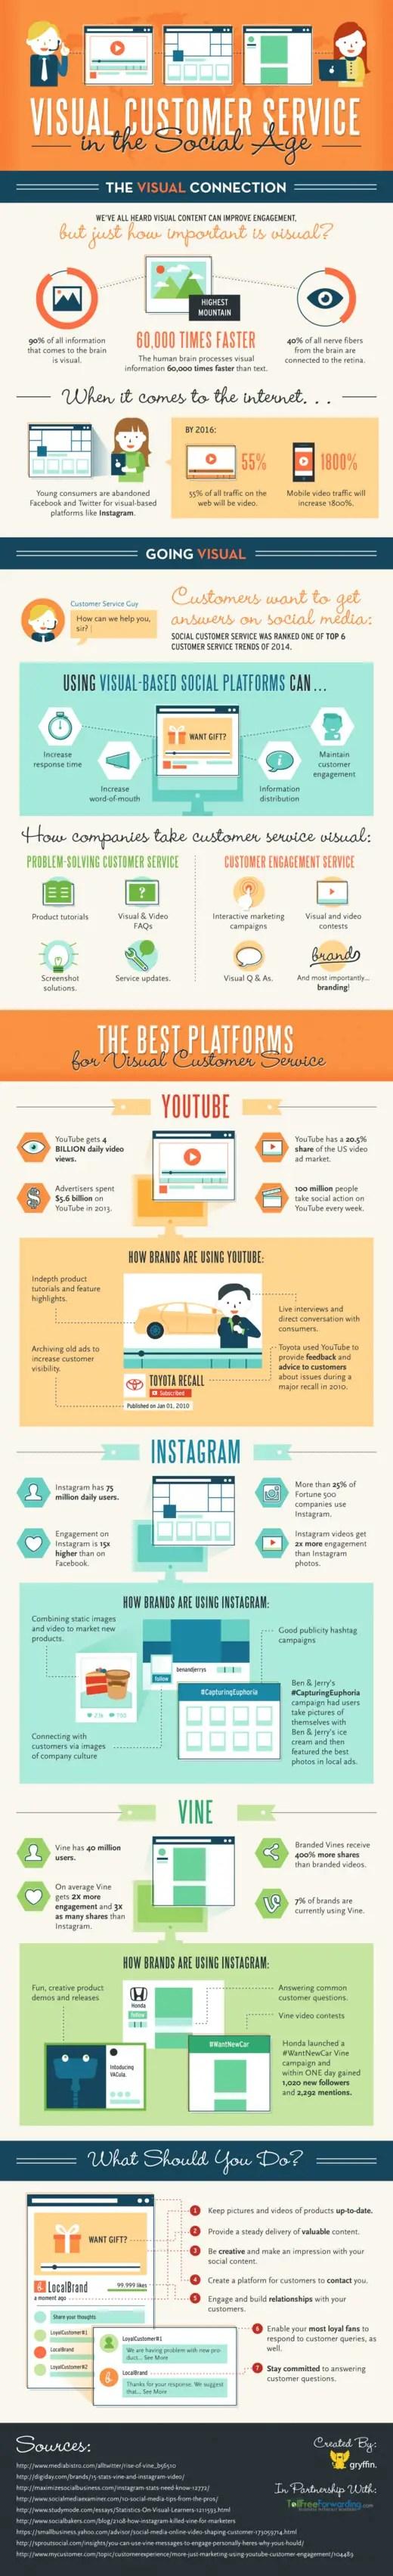 social-visual-customer-service